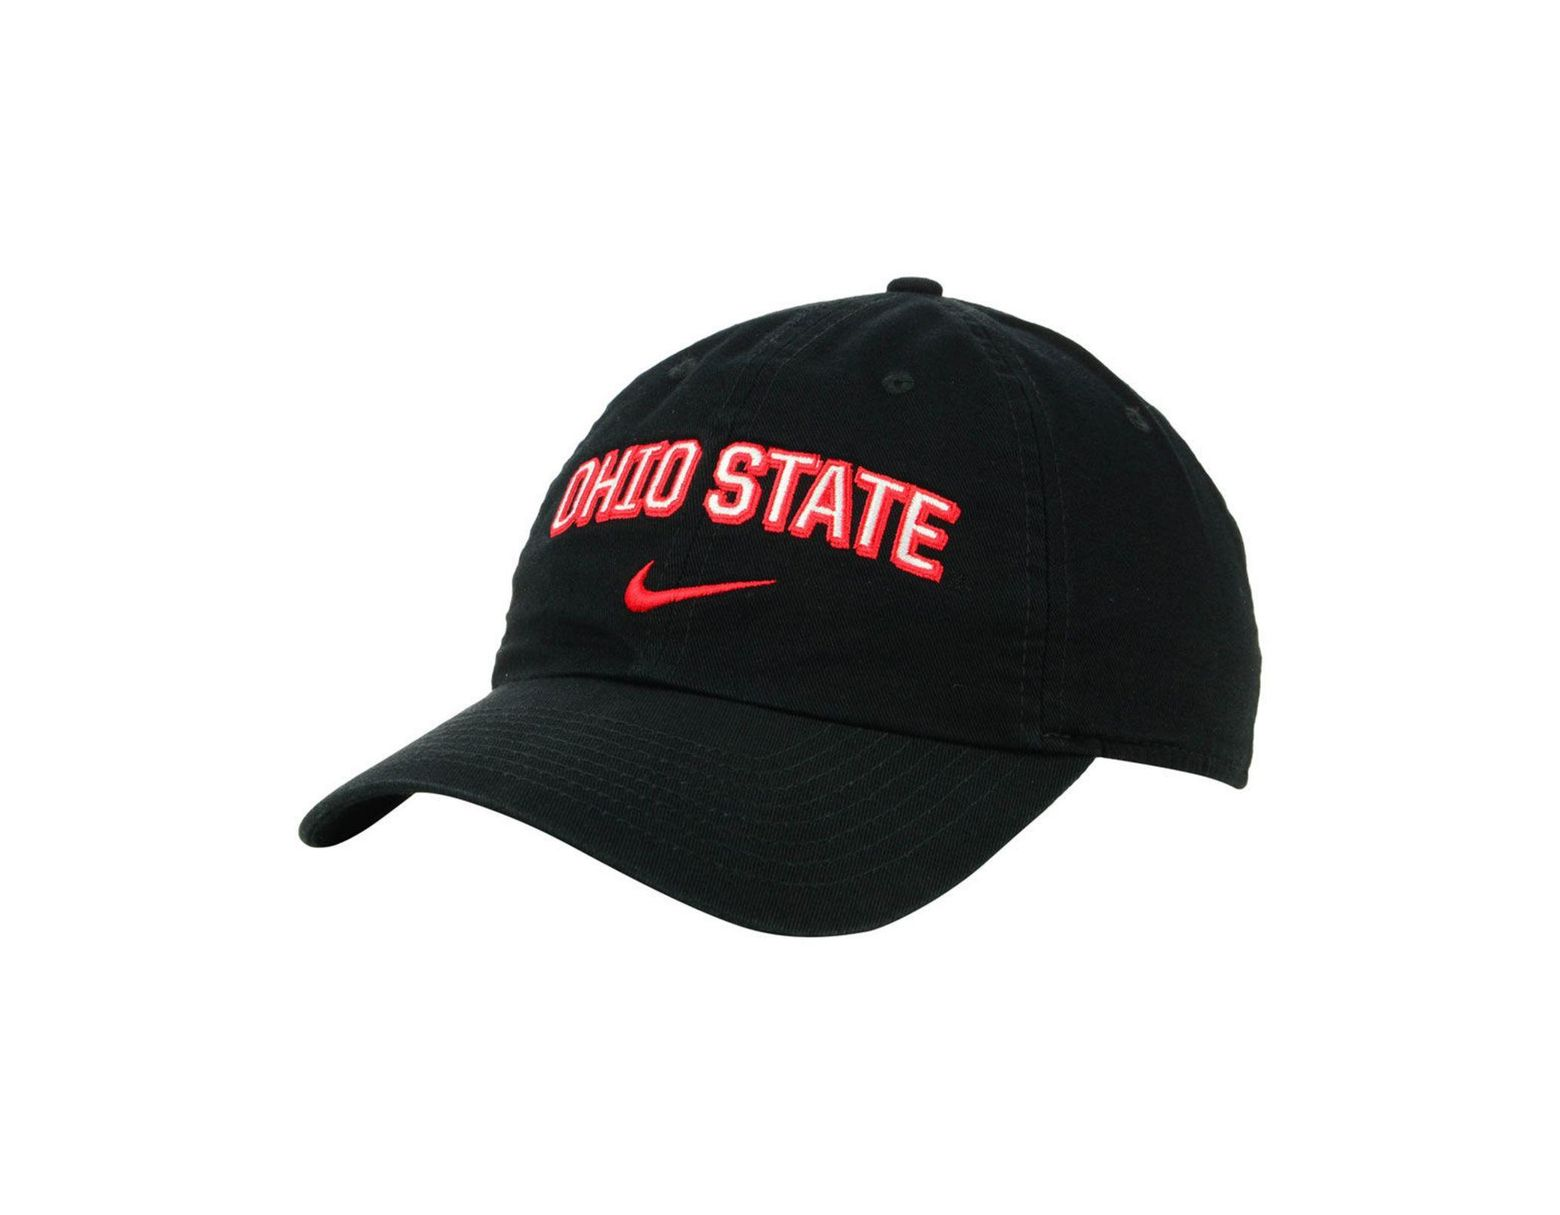 size 40 0e12f 1f914 Nike Ohio State Buckeyes H86 Wordmark Swoosh Cap in Black for Men - Lyst